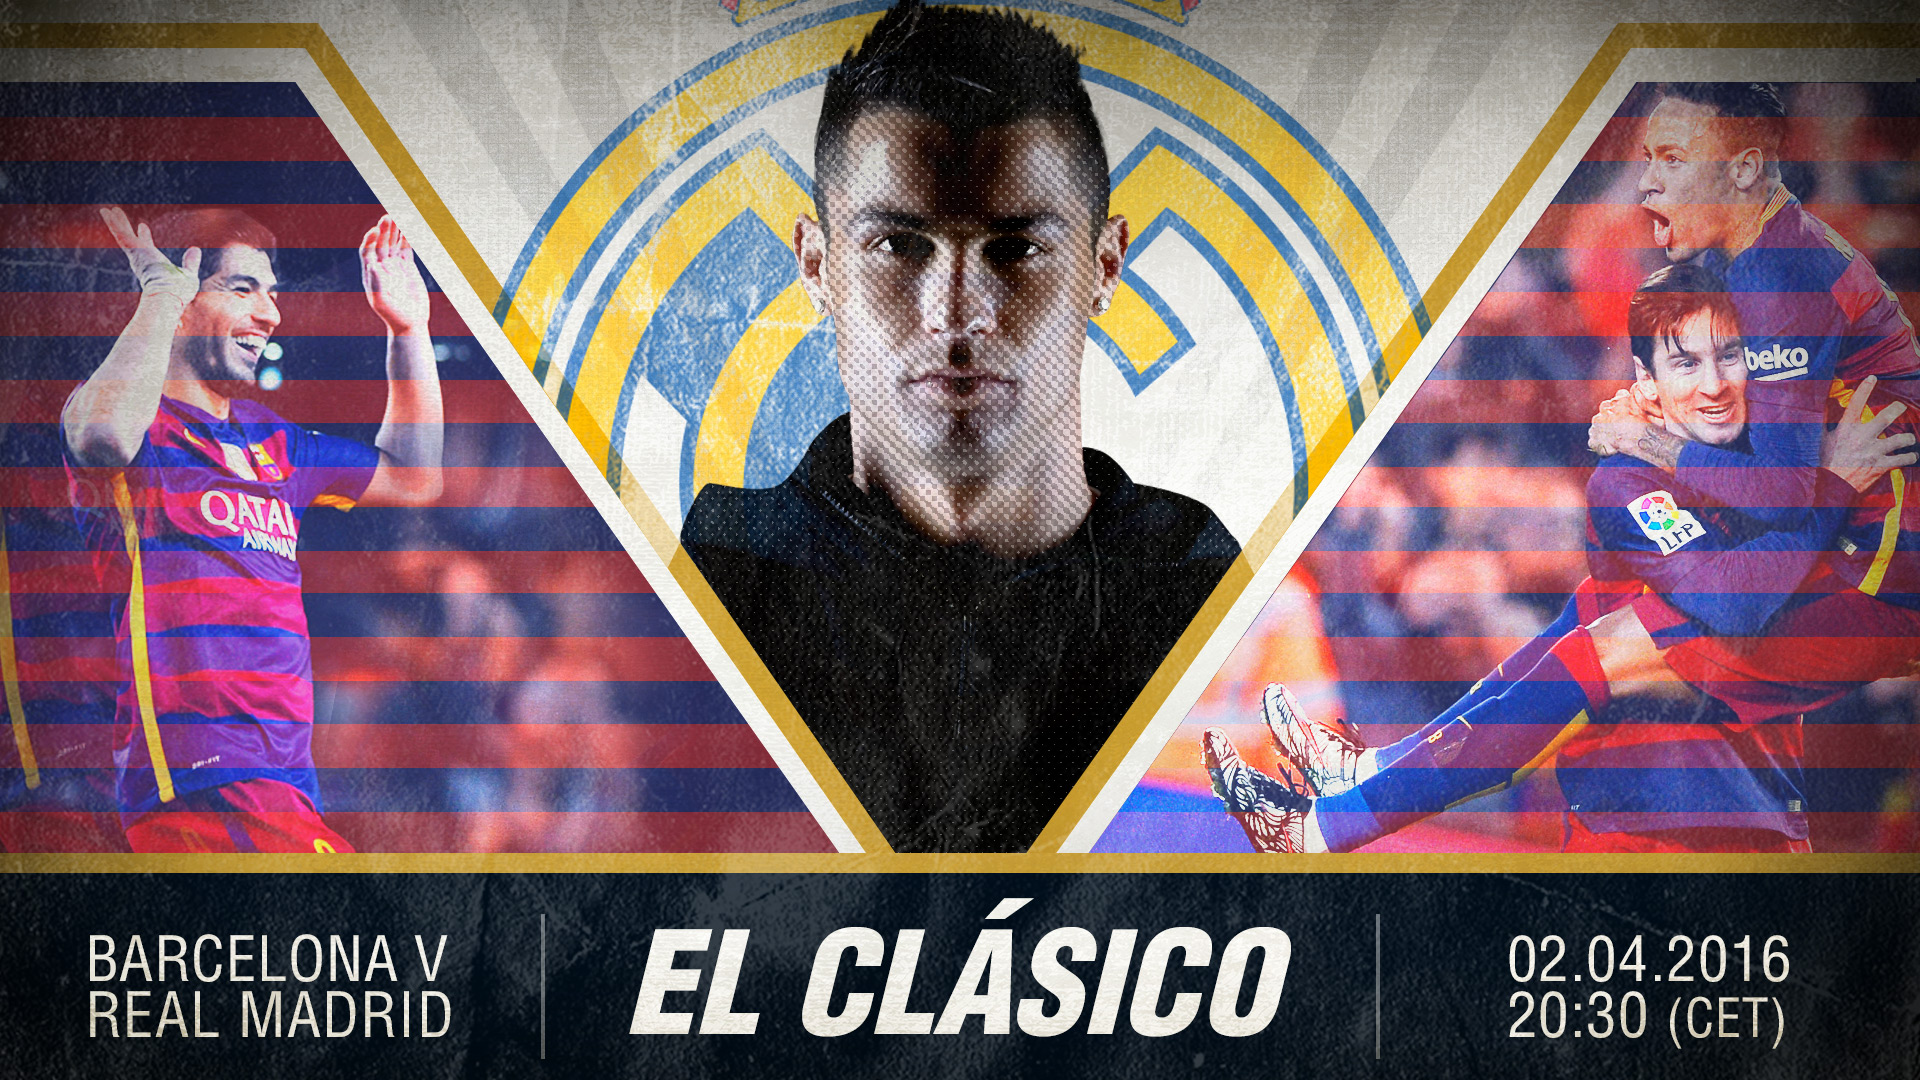 Barcelona Real Madrid El Clasico Goalcom